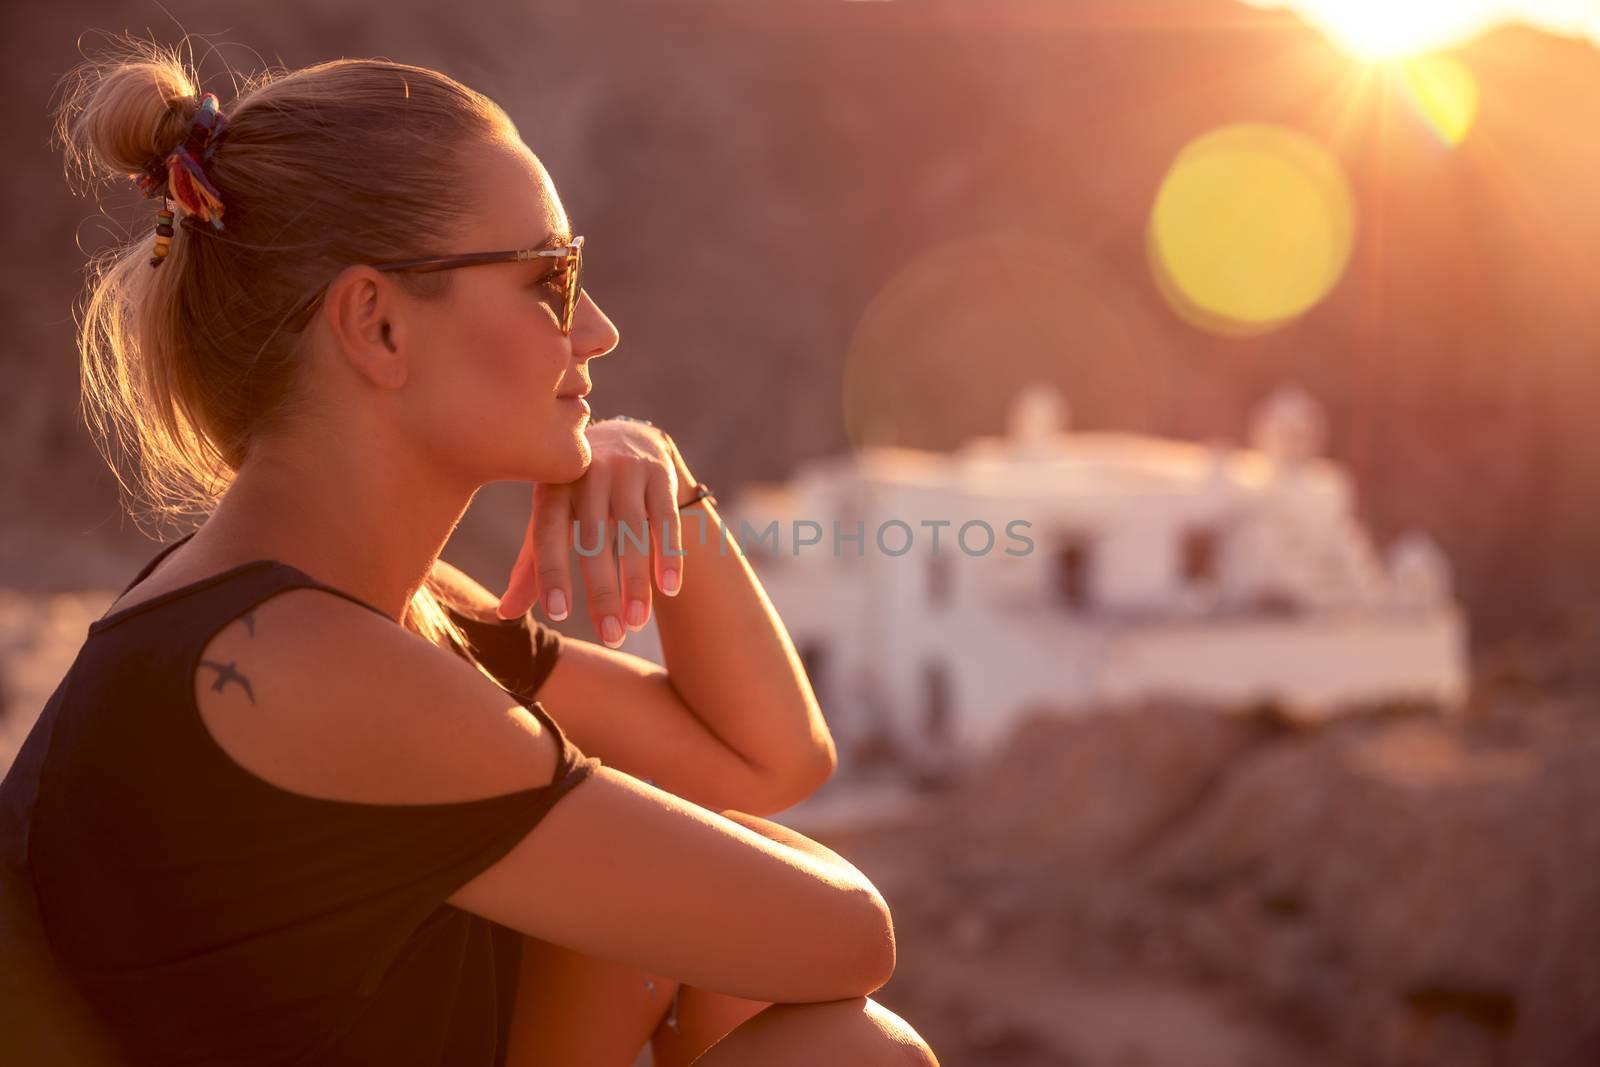 Beautiful woman enjoying spiritual travel to the wonderful place, sunset light scene, sitting on the mountains near the monastery, happy summer holidays